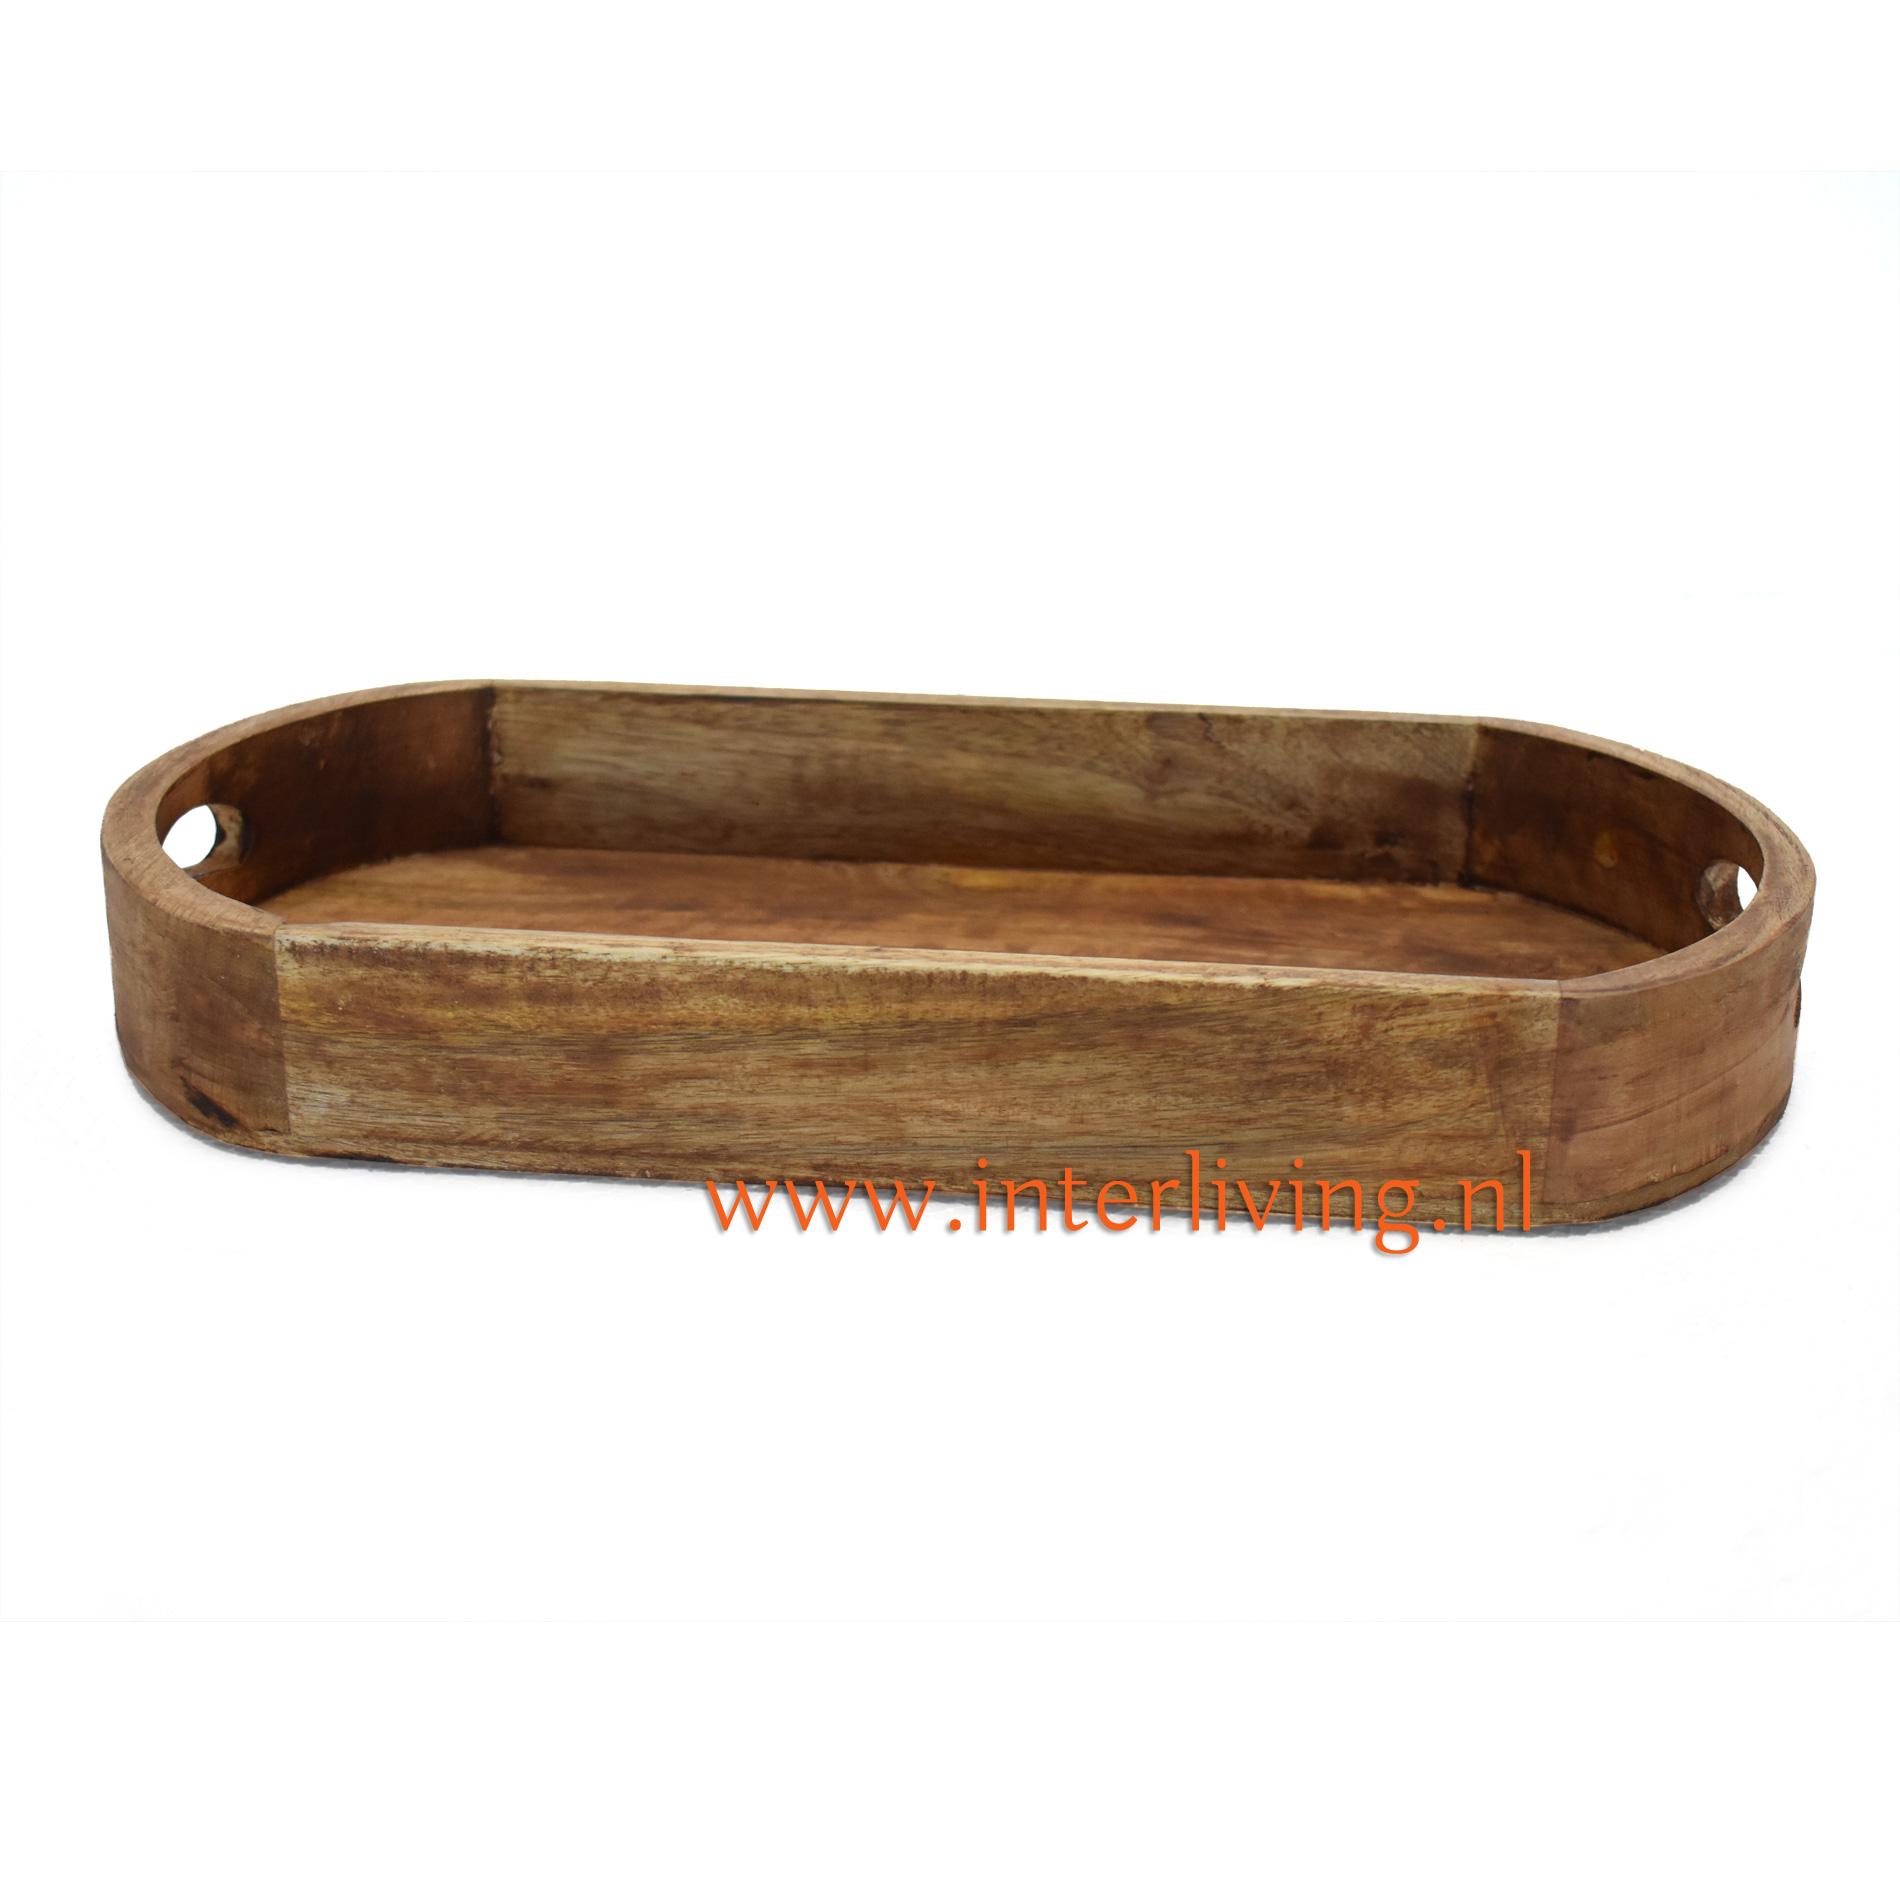 mangohouten dienblad van donker gekleurd hout - landelijk stoer en sober wonen